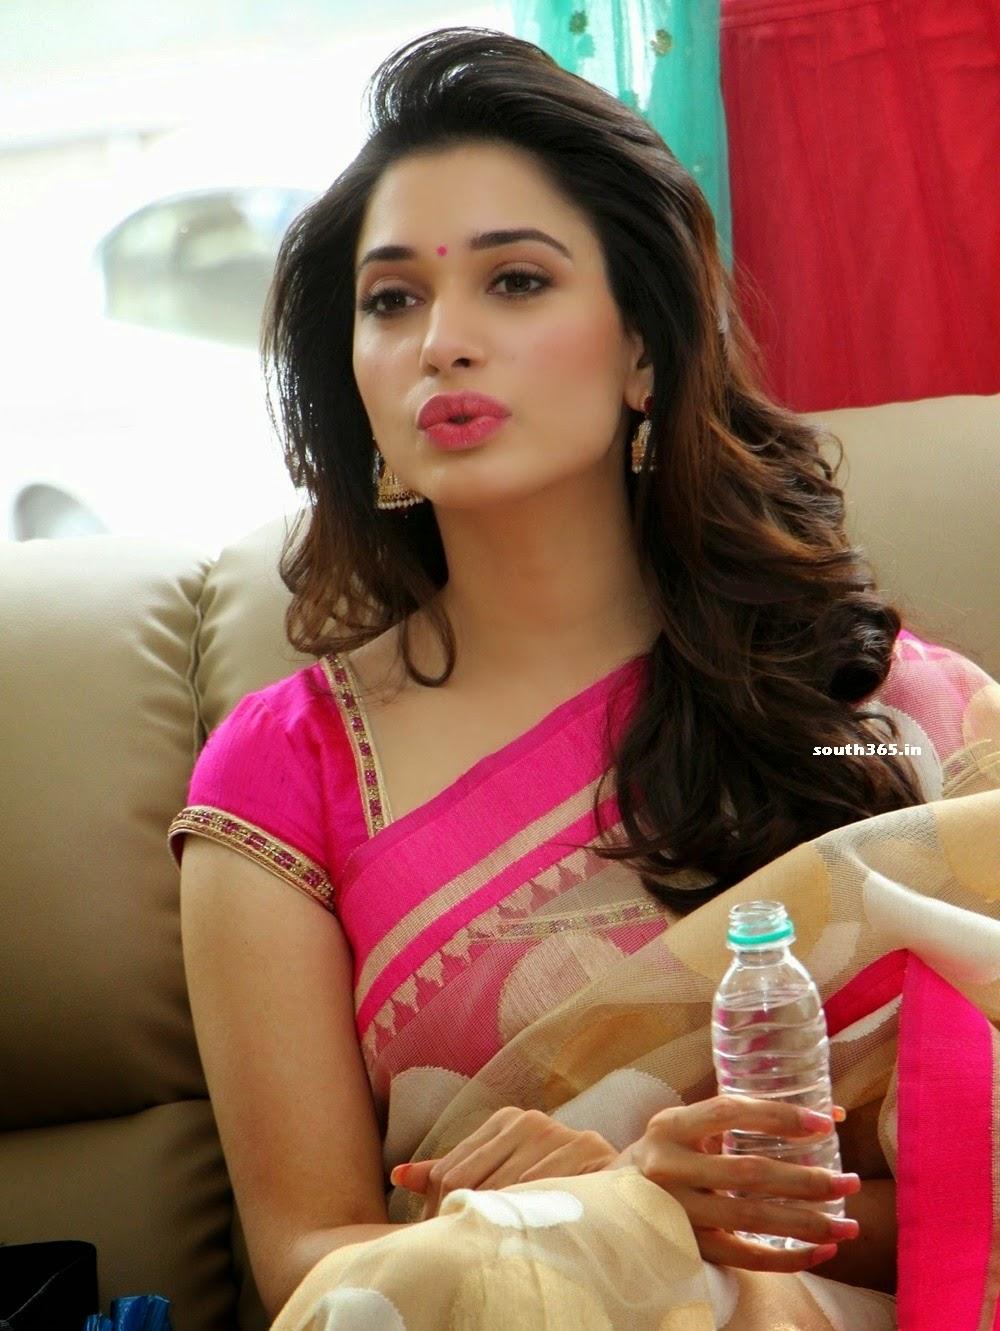 Sexy aunty in saree hd